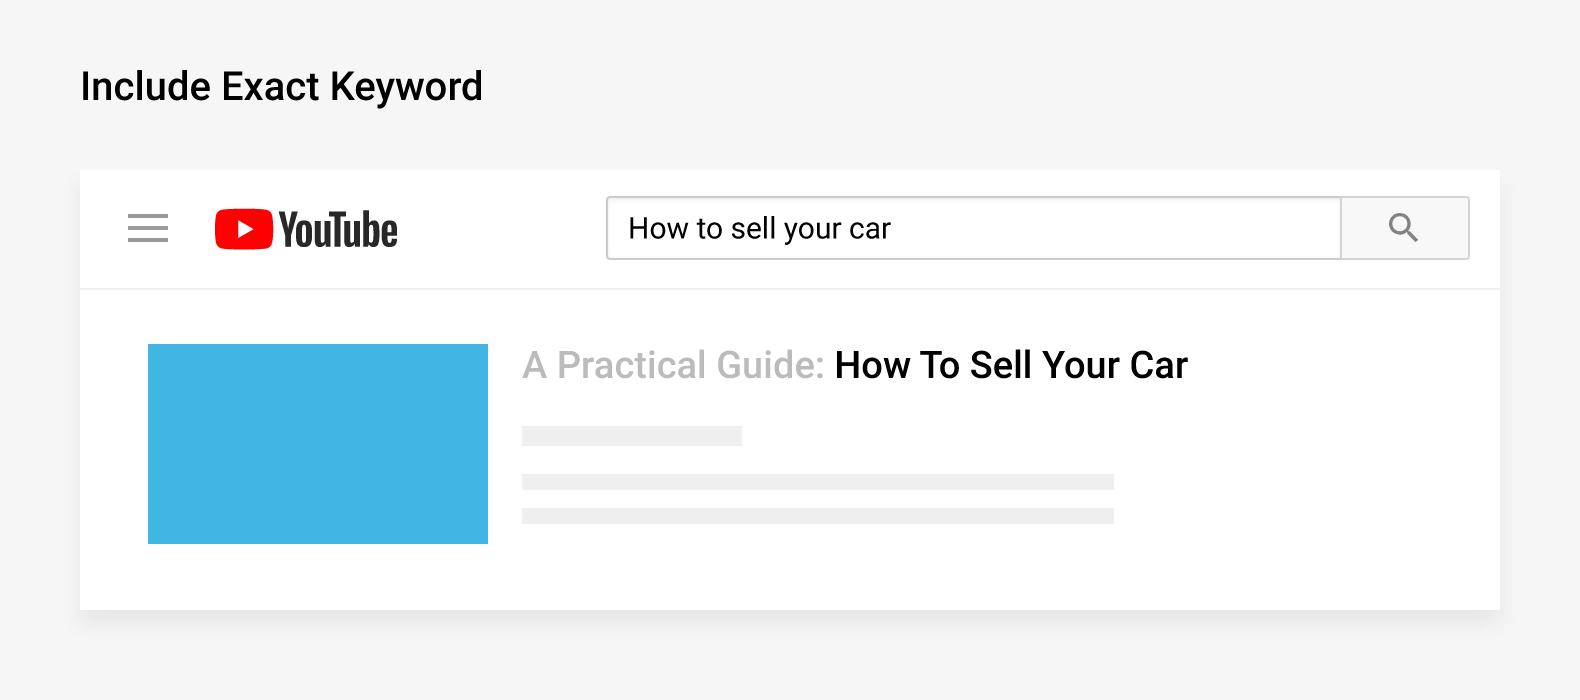 Include exact keyword